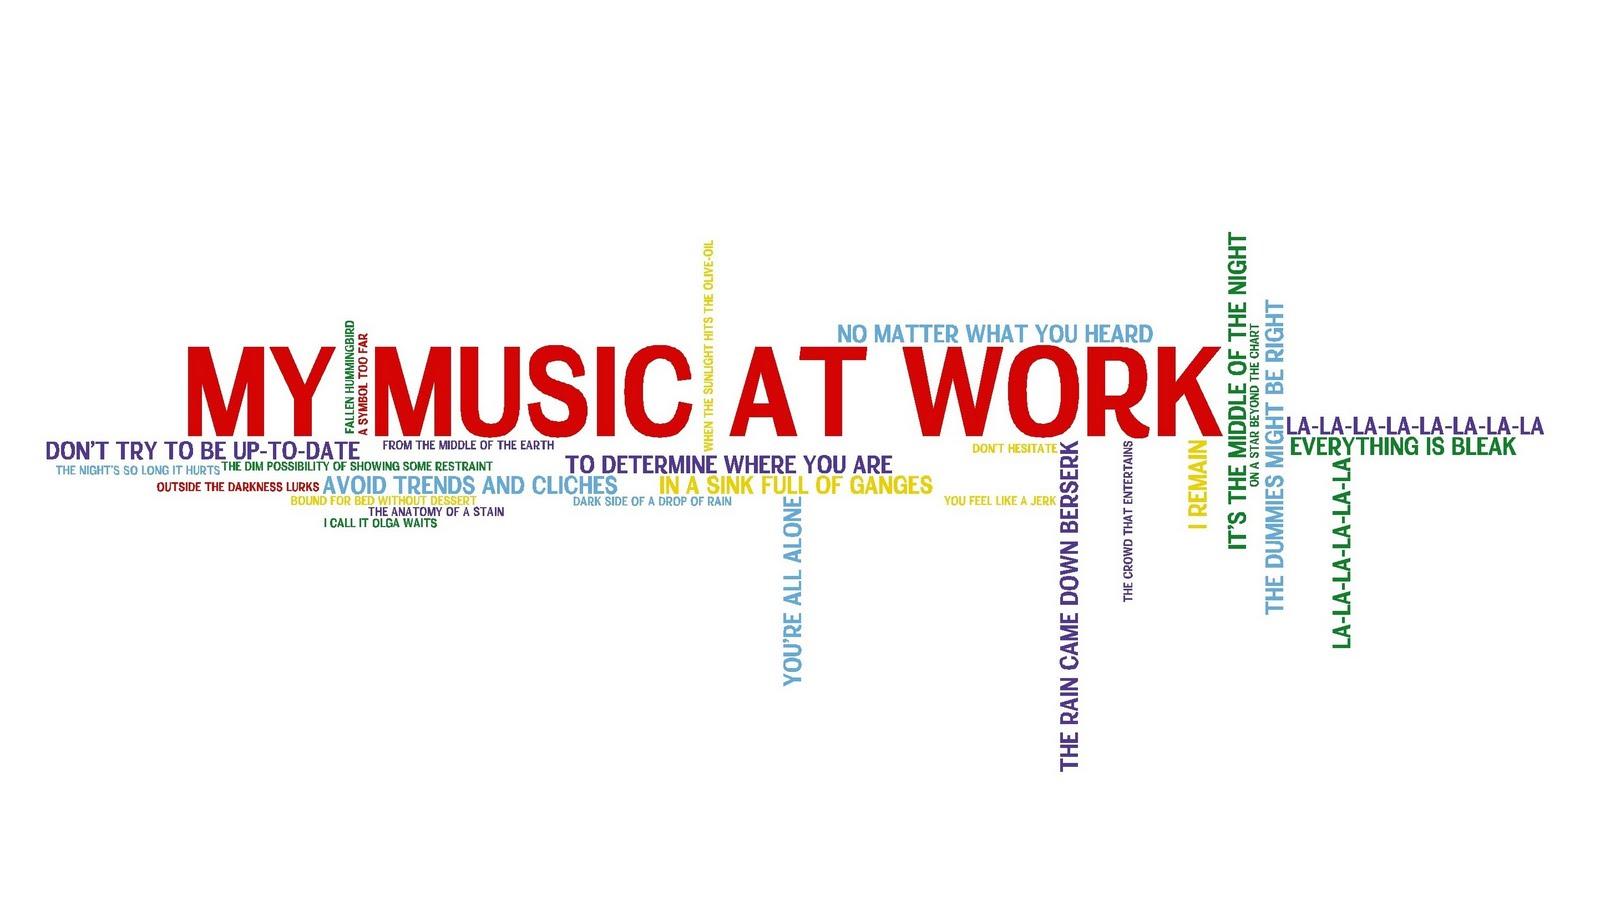 Hip Tour: My Music At Work - Lyrics